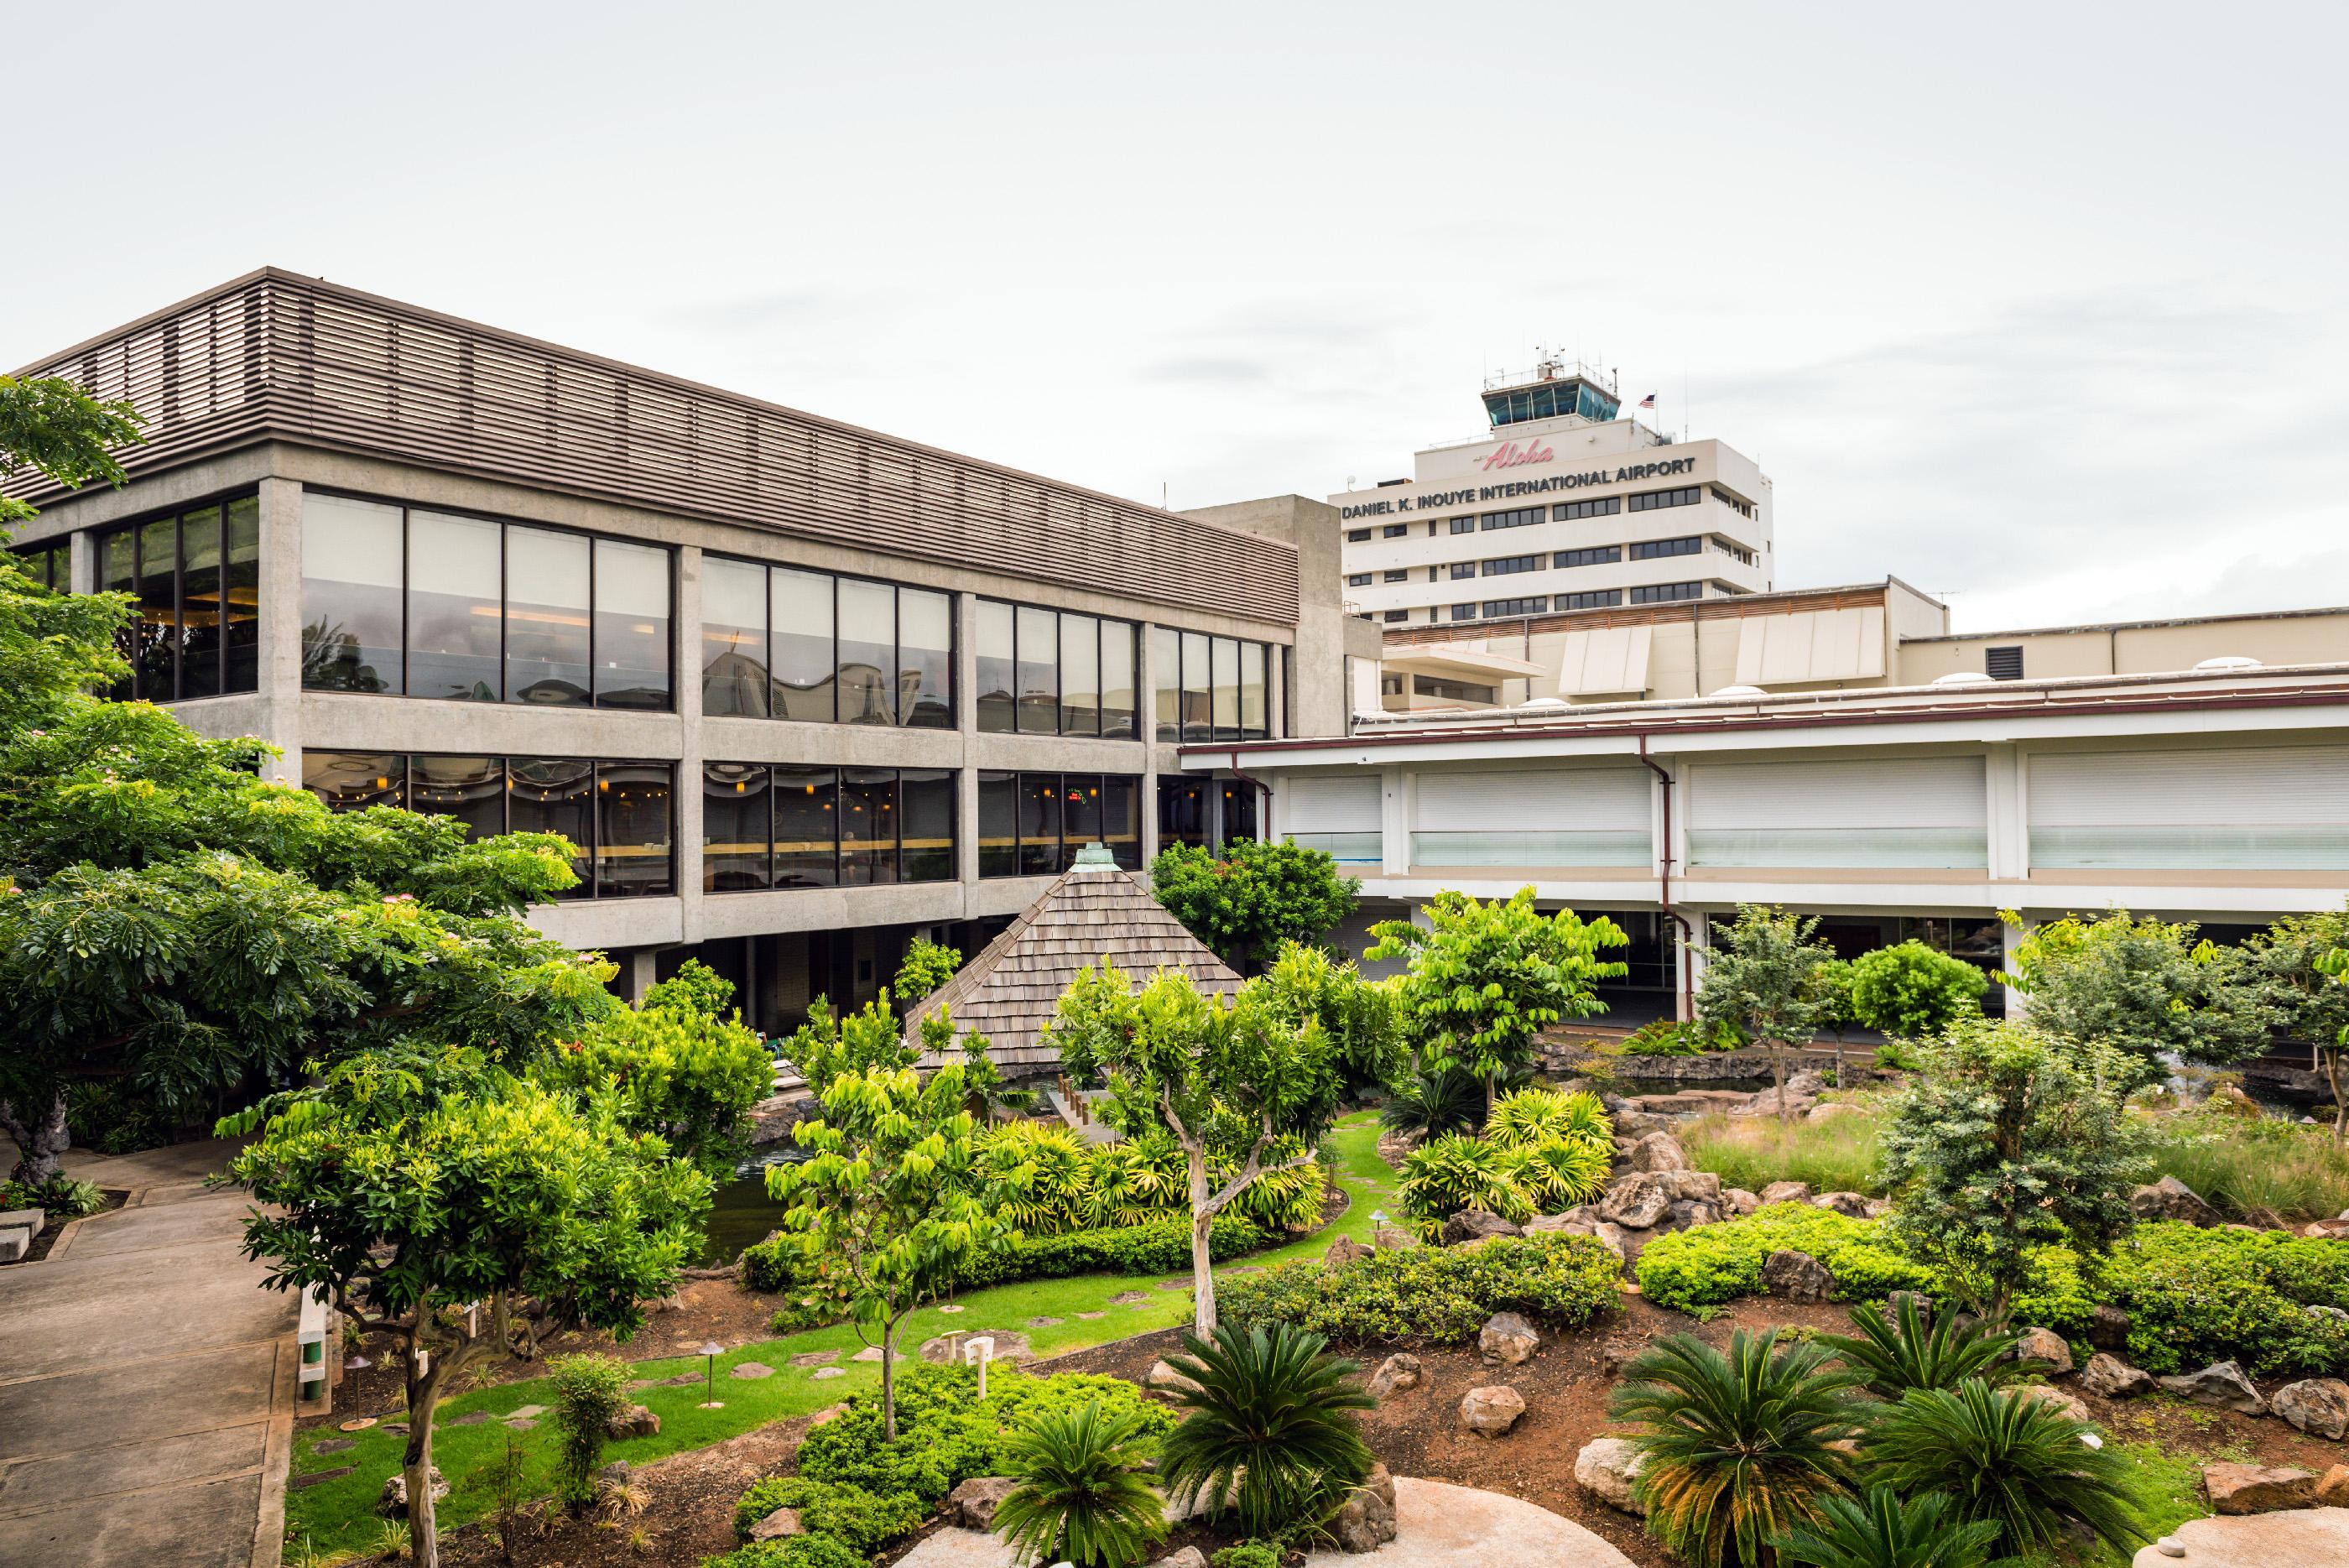 Cultural gardens at Daniel K. Inouye International Airport show Asian influence on Hawaiian culture, August 26, 2018.